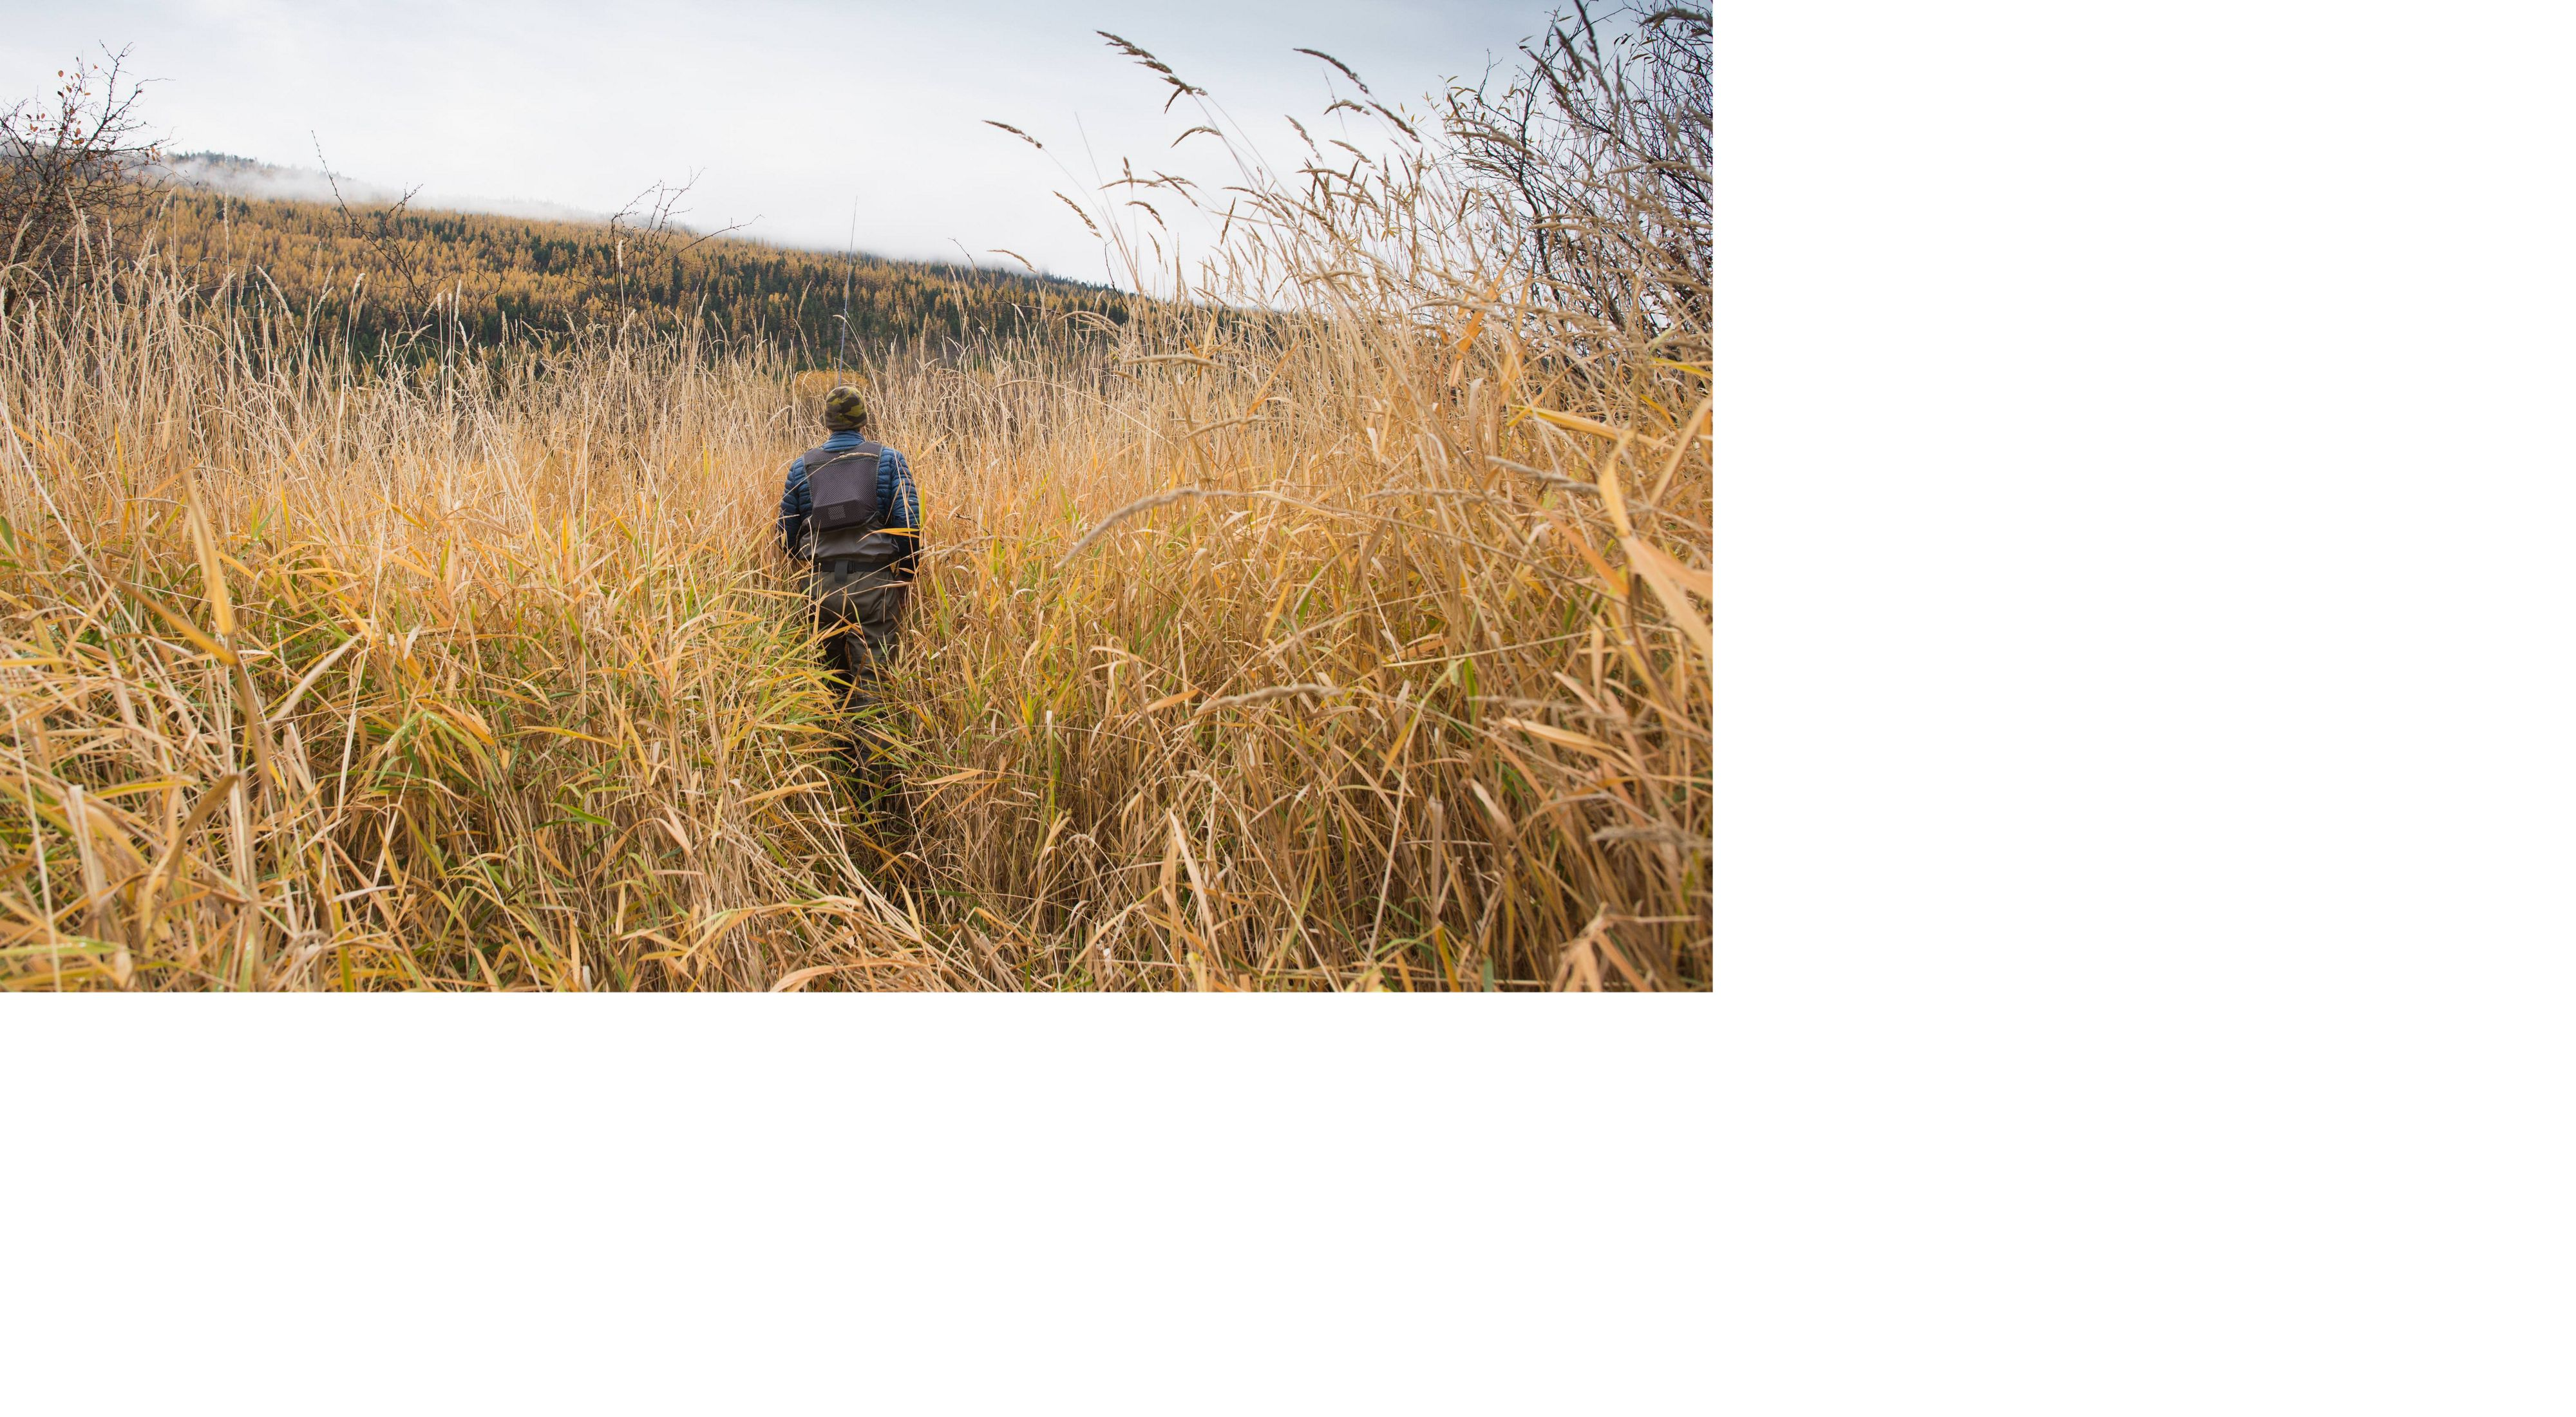 back view of someone walking through high yellow reeds